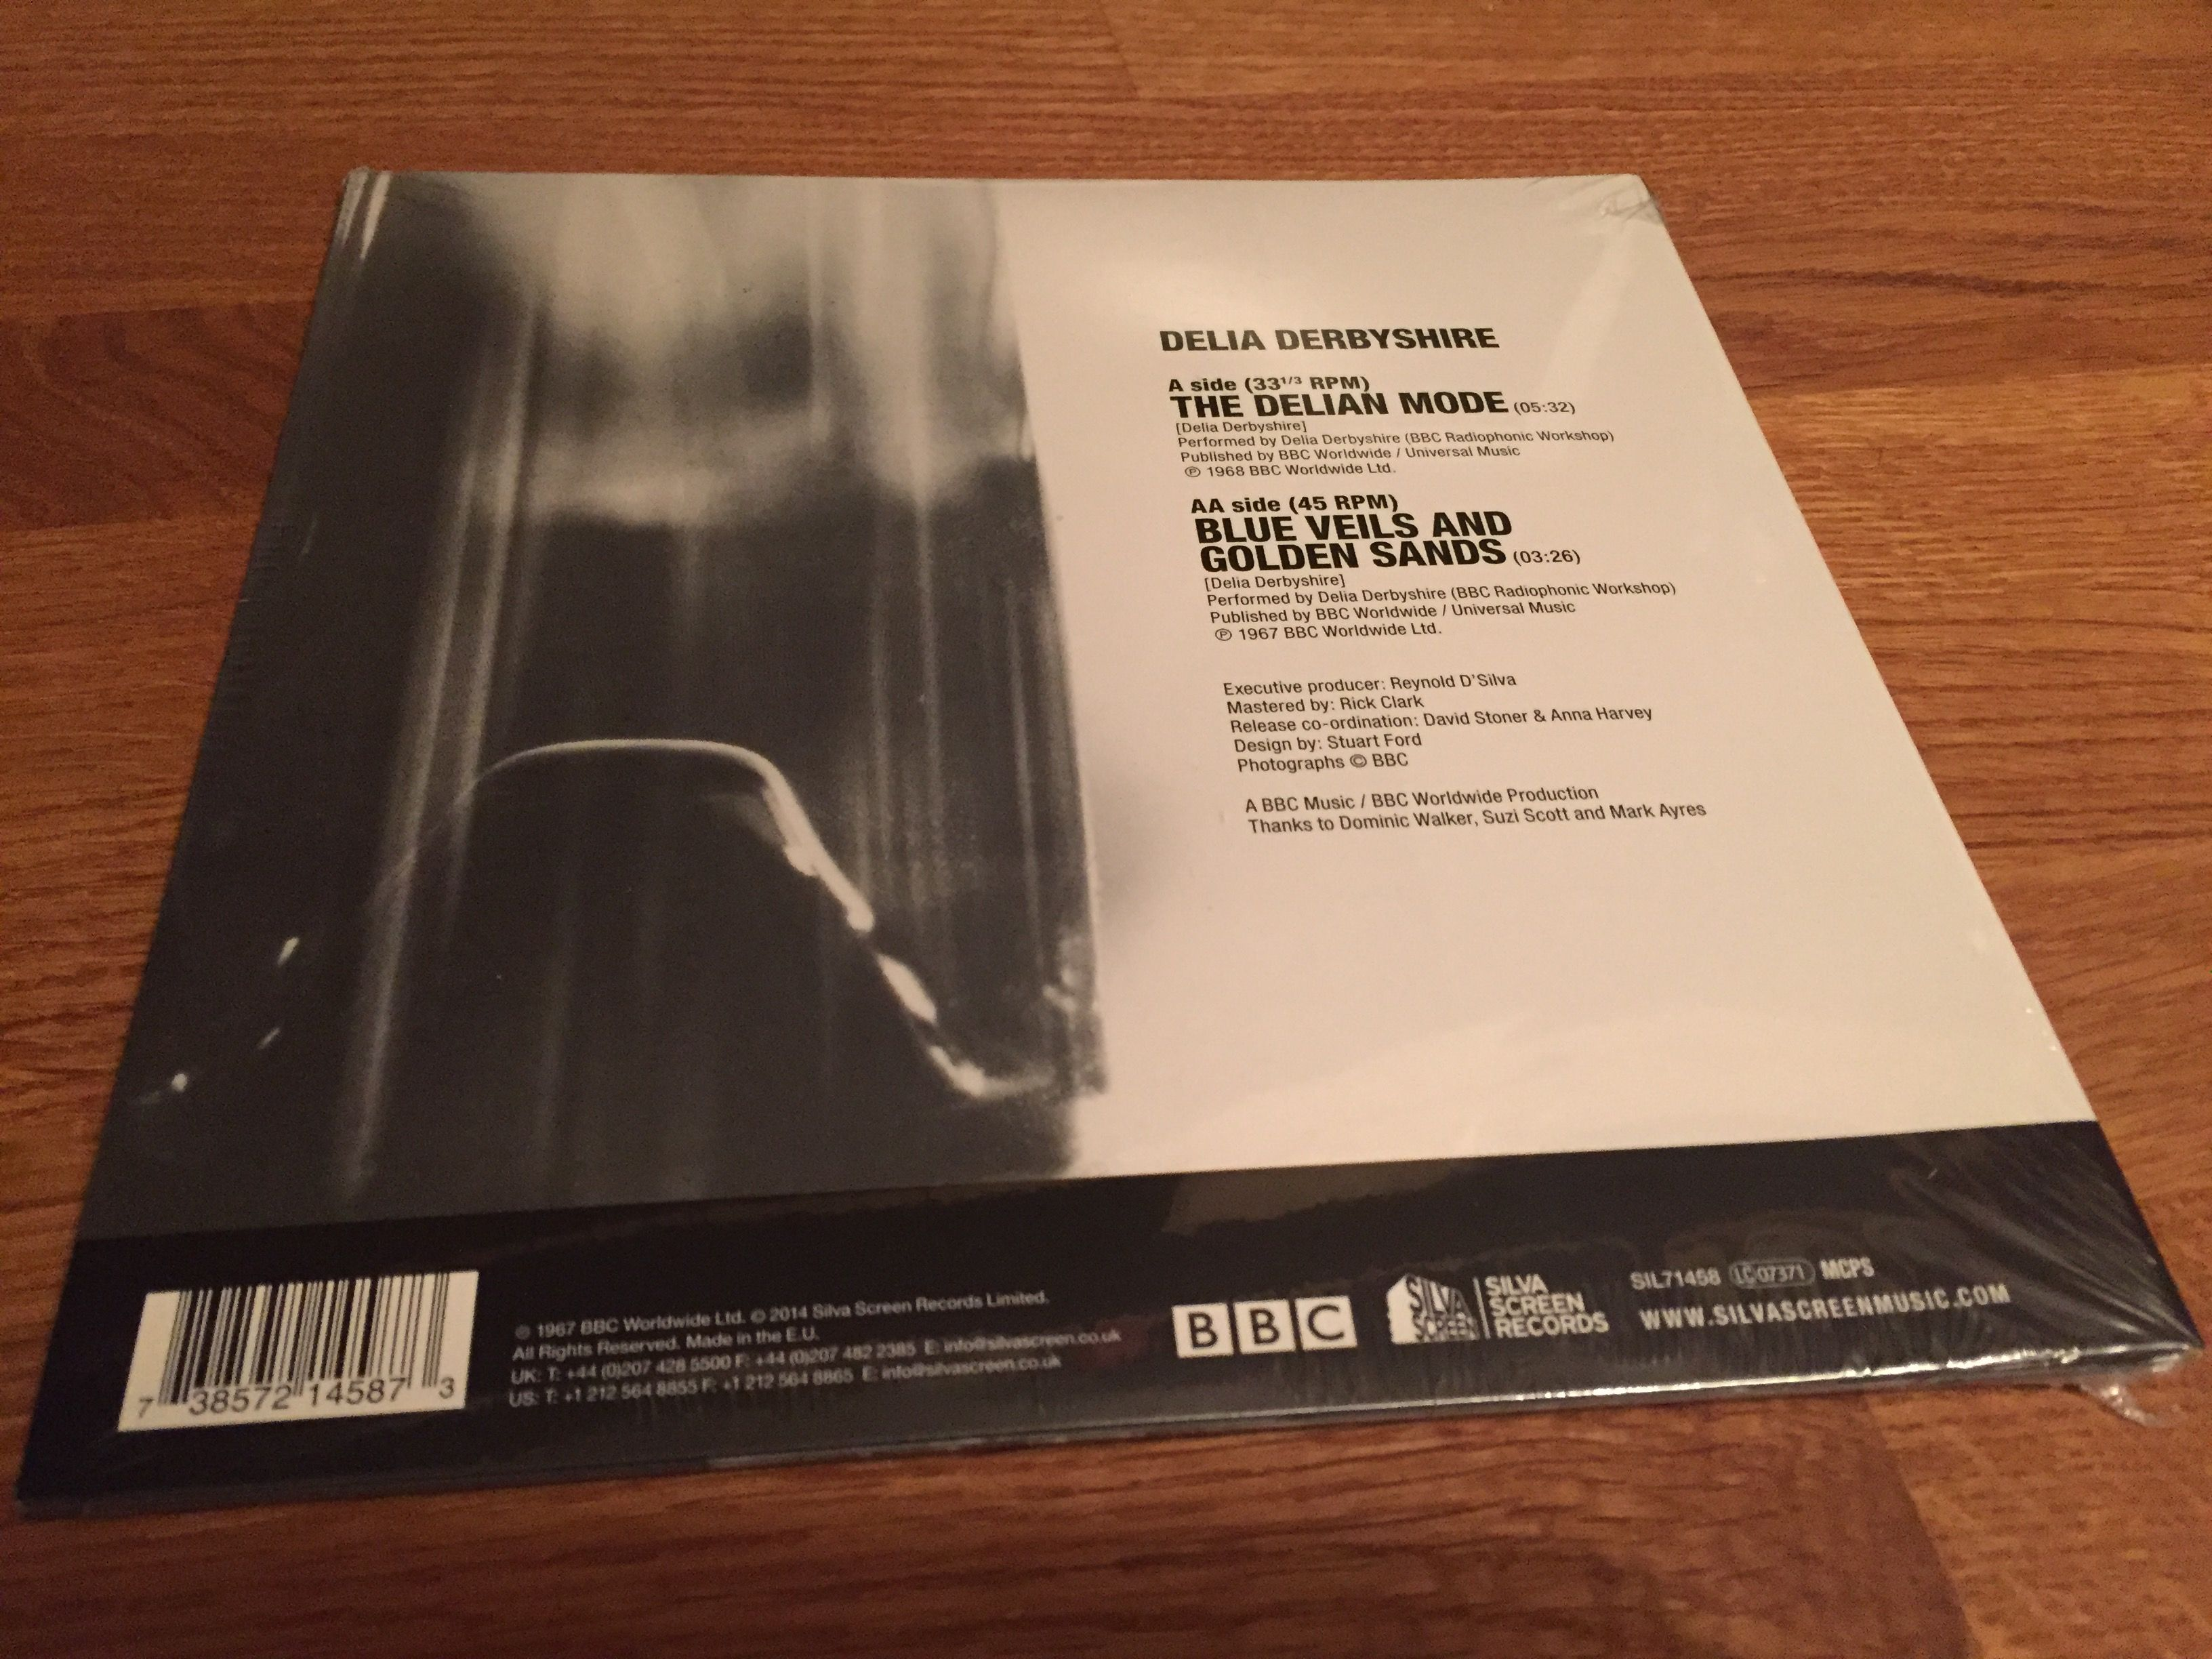 Delia Derbyshire - The Delian Mode